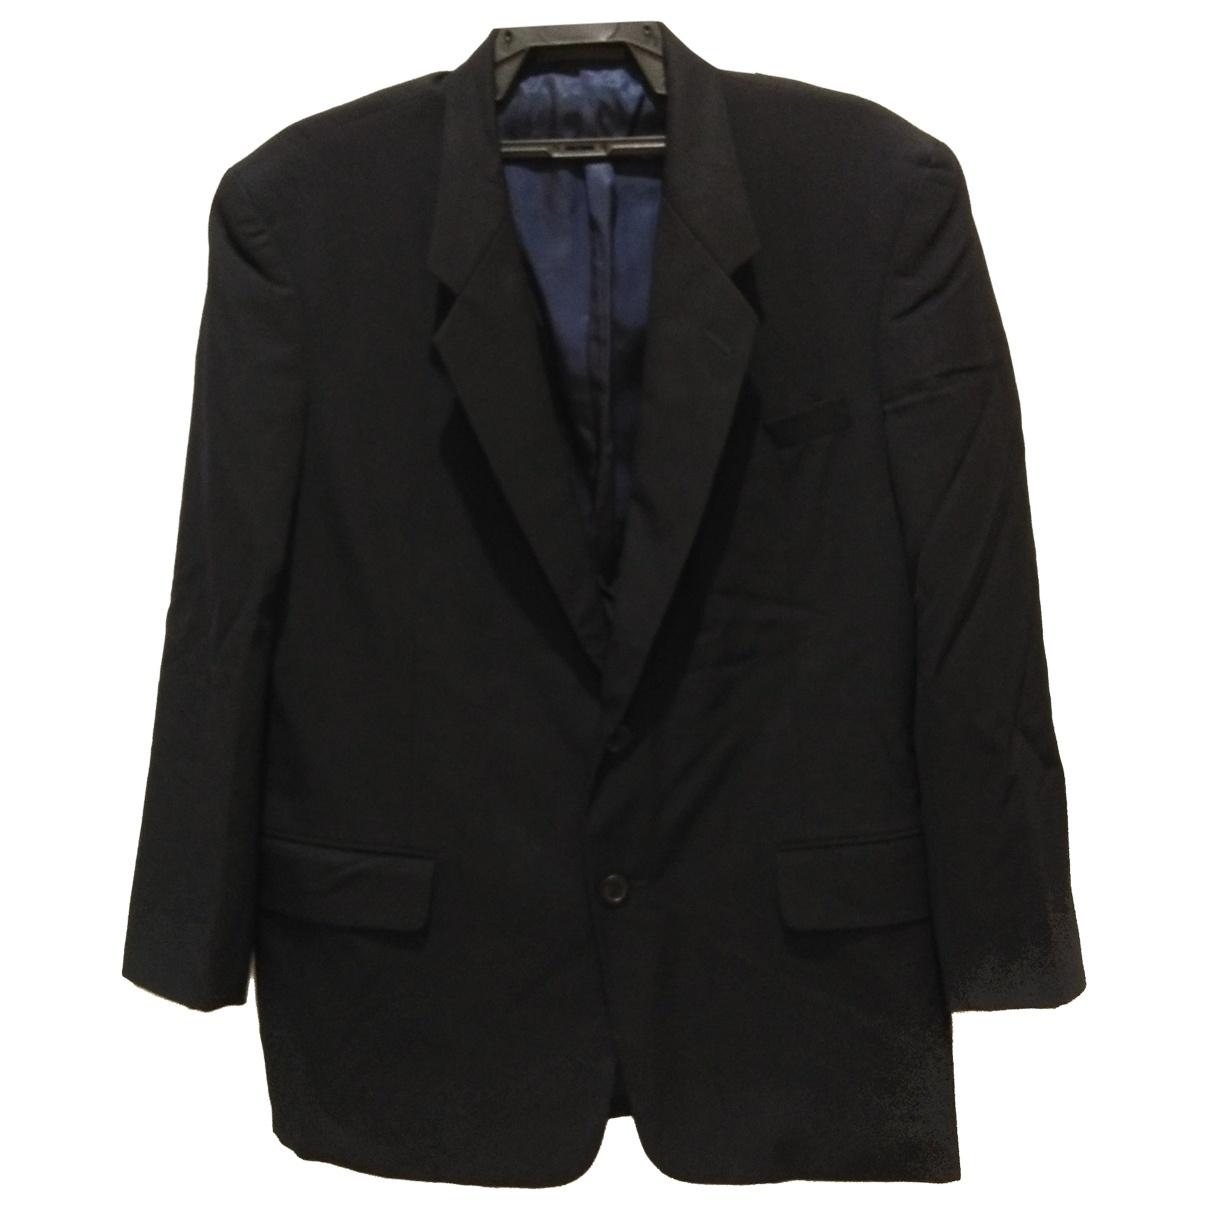 Yohji Yamamoto \N Black Wool jacket  for Men S International